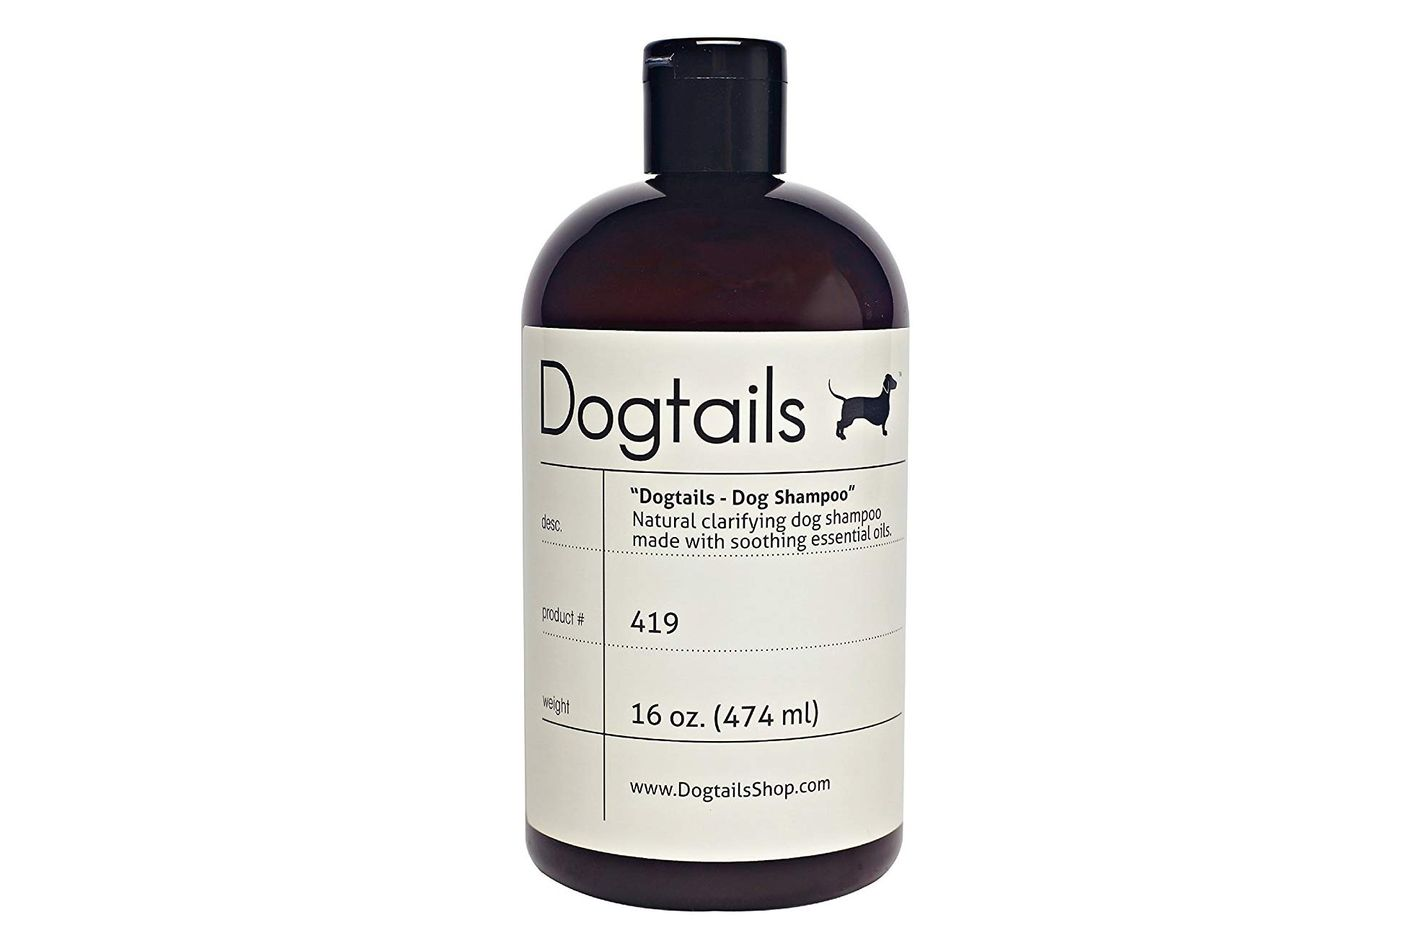 Dogtails Dog Shampoo